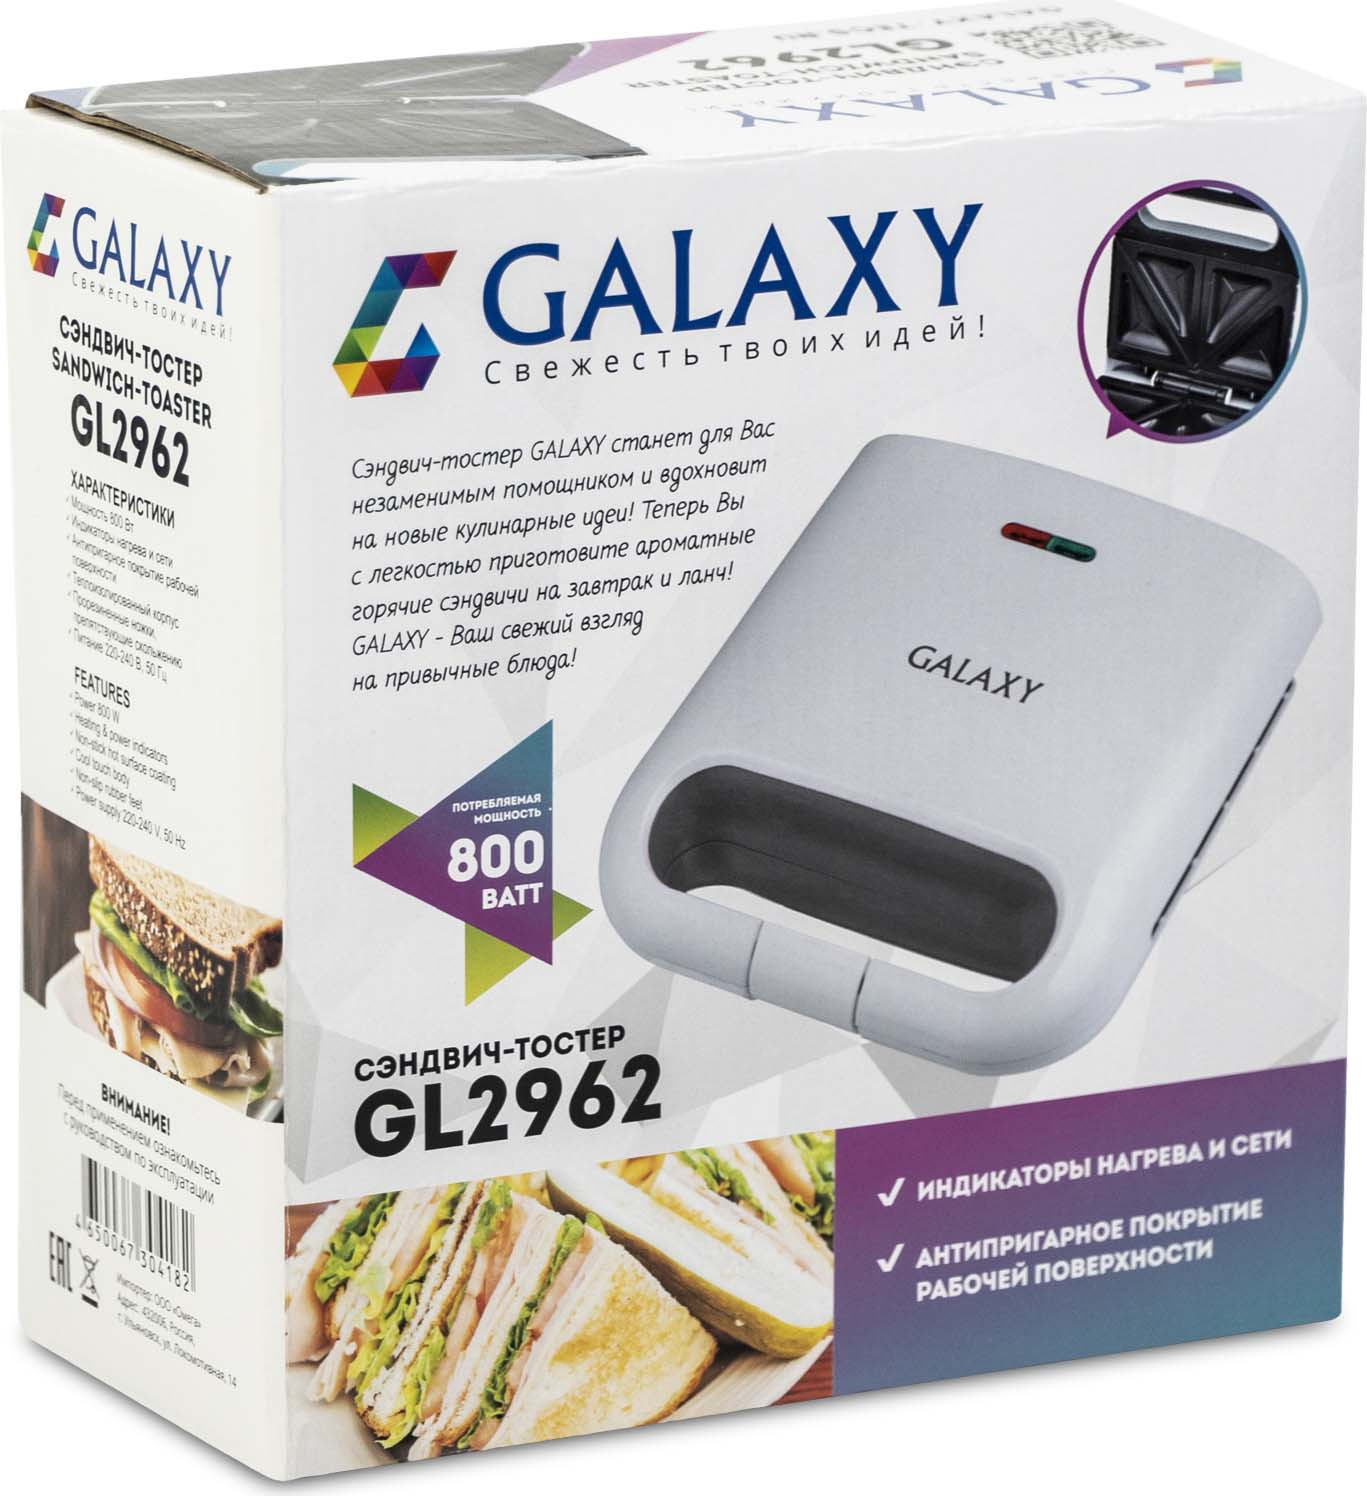 Бутербродница Galaxy GL 2962, цвет: белый, серый Galaxy